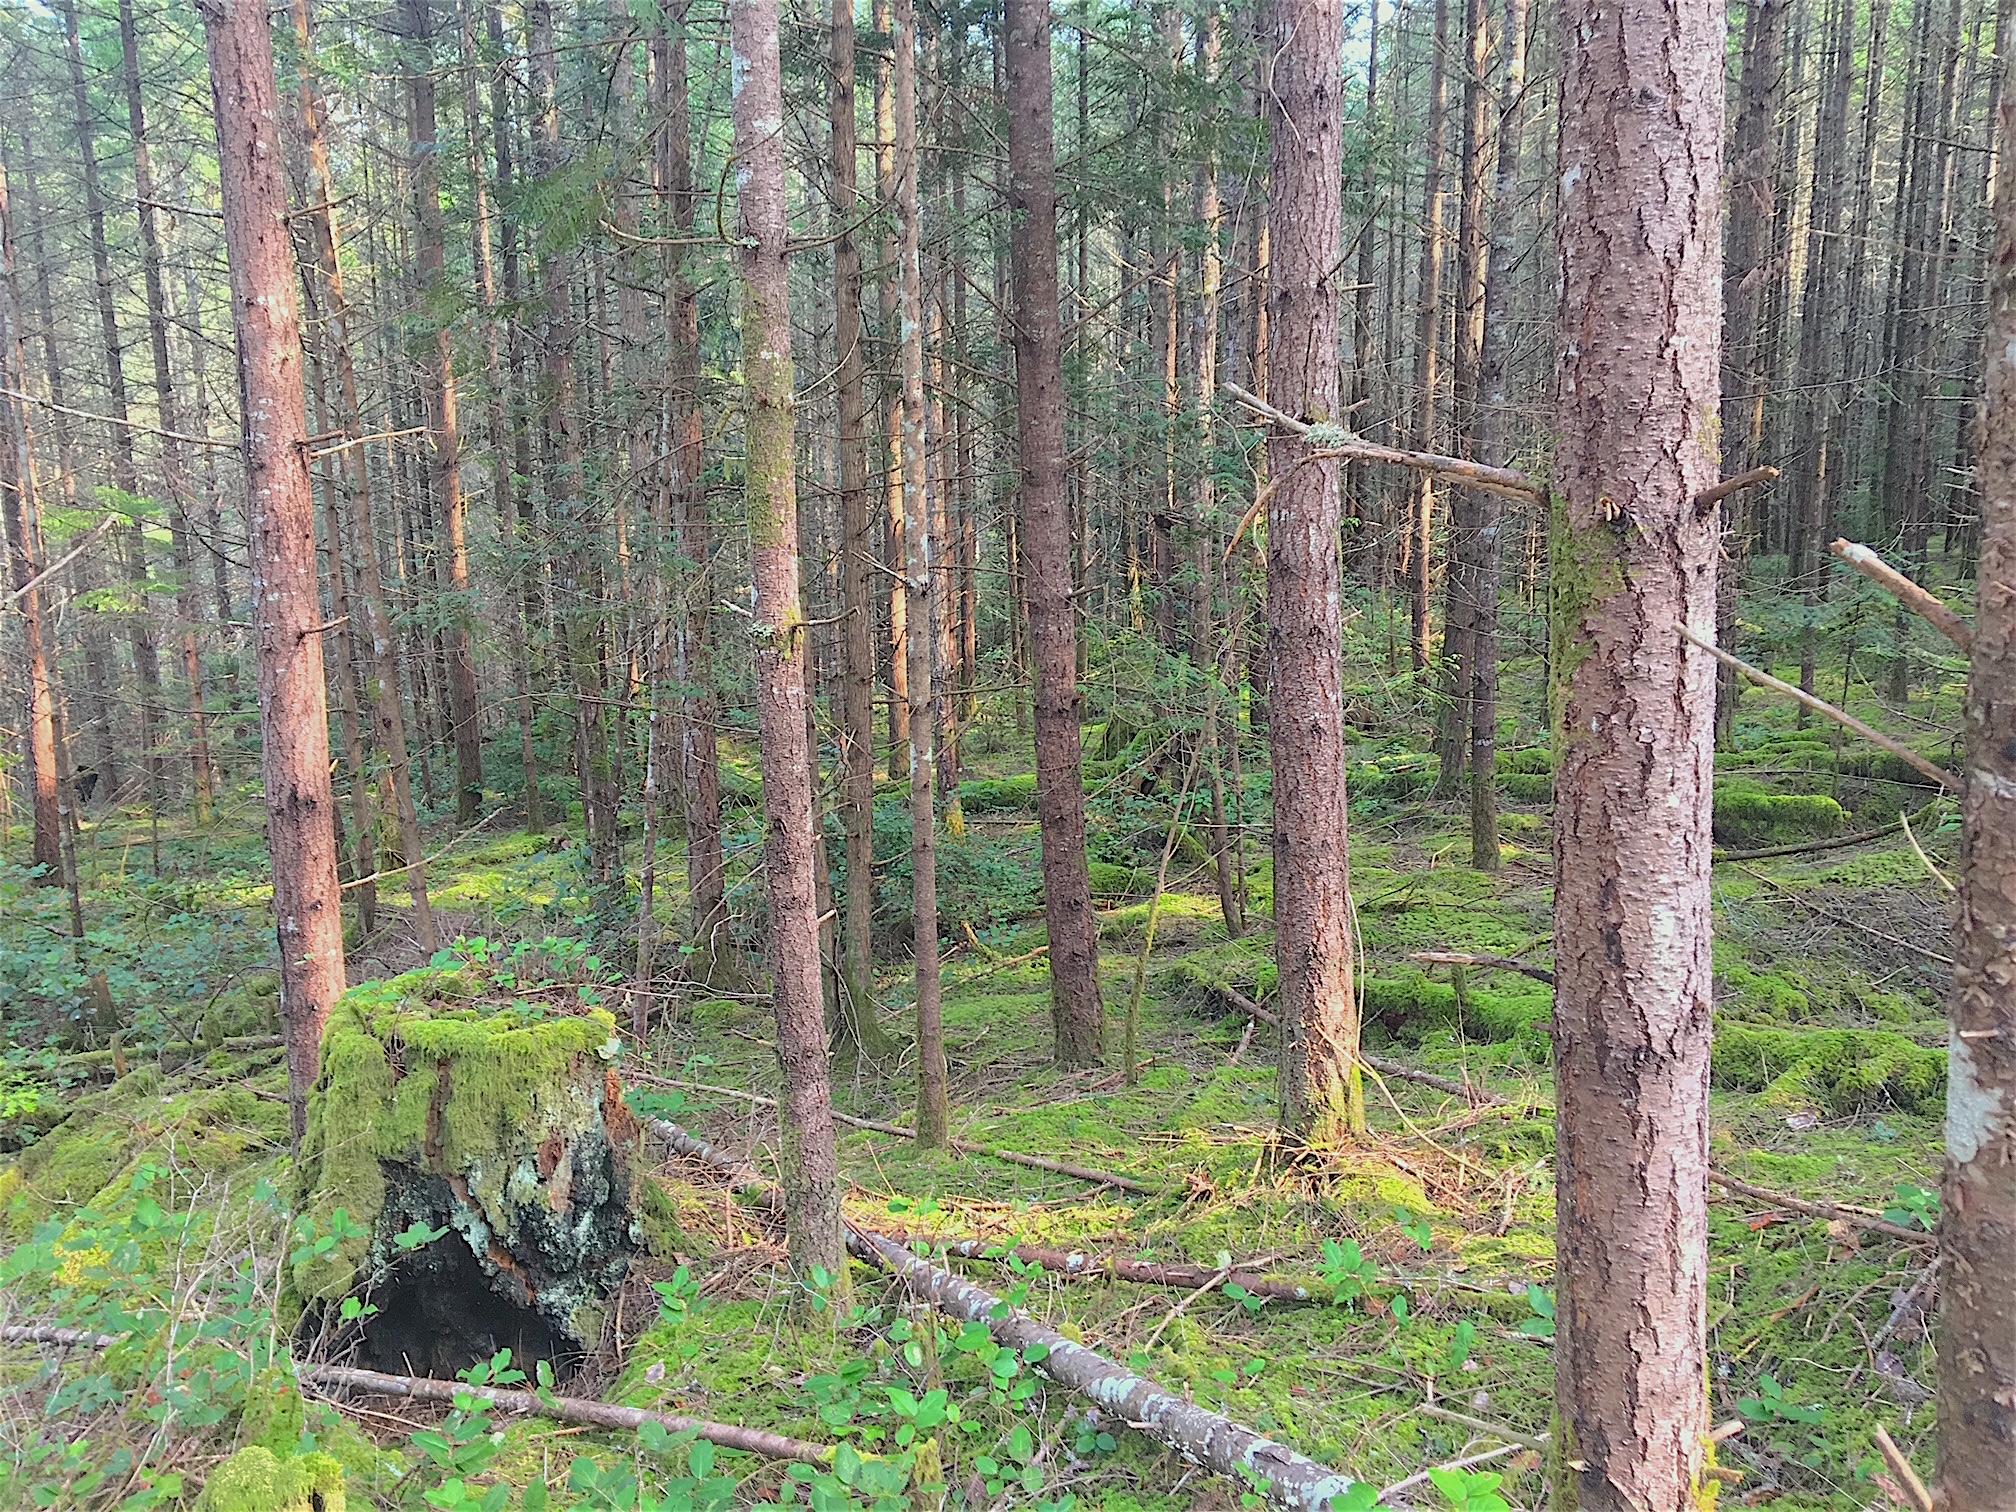 Trees and Stump.jpg